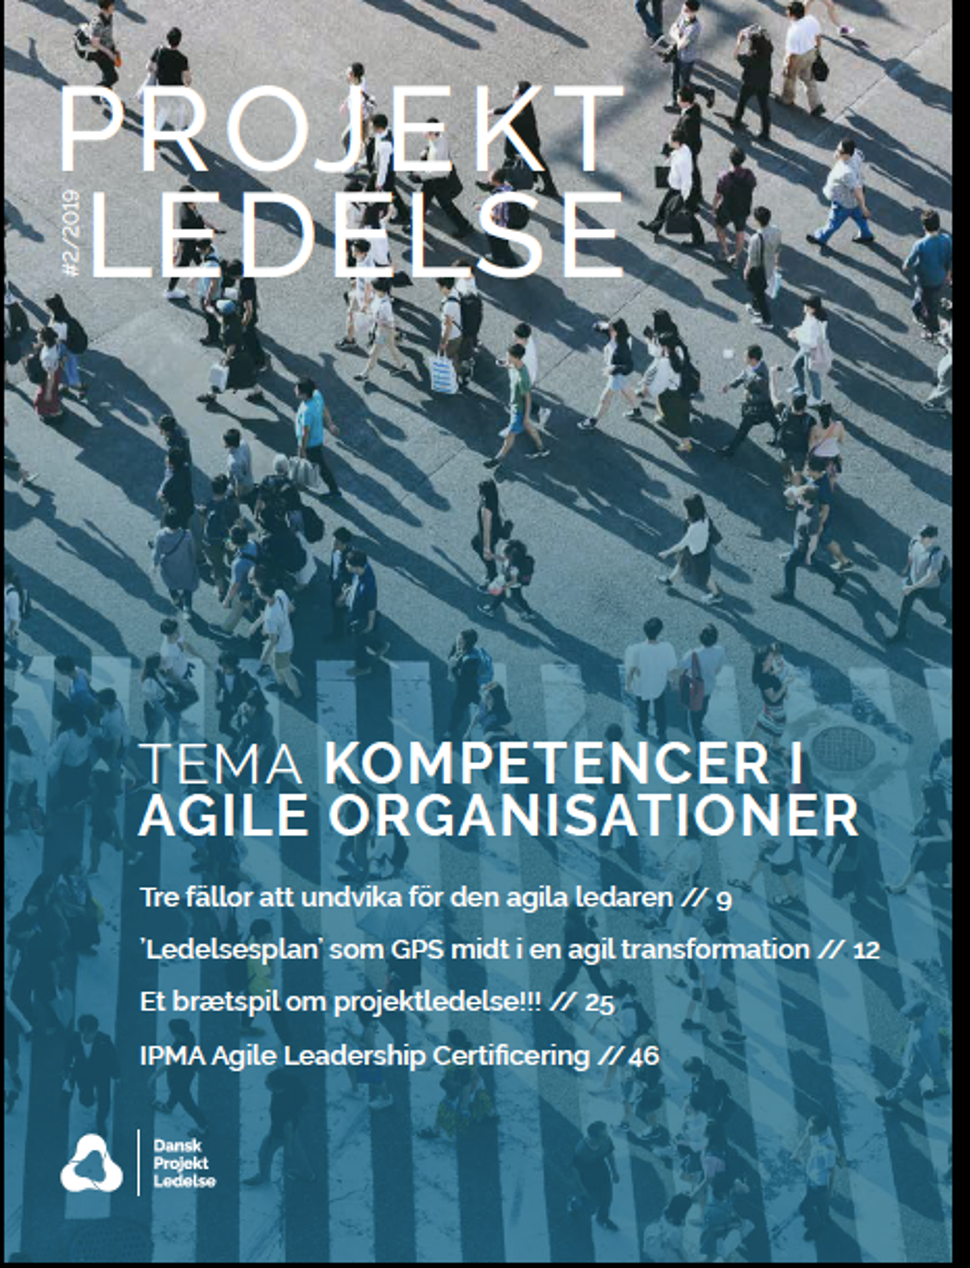 Dansk Projektledelse medlemsbladet 2019.02